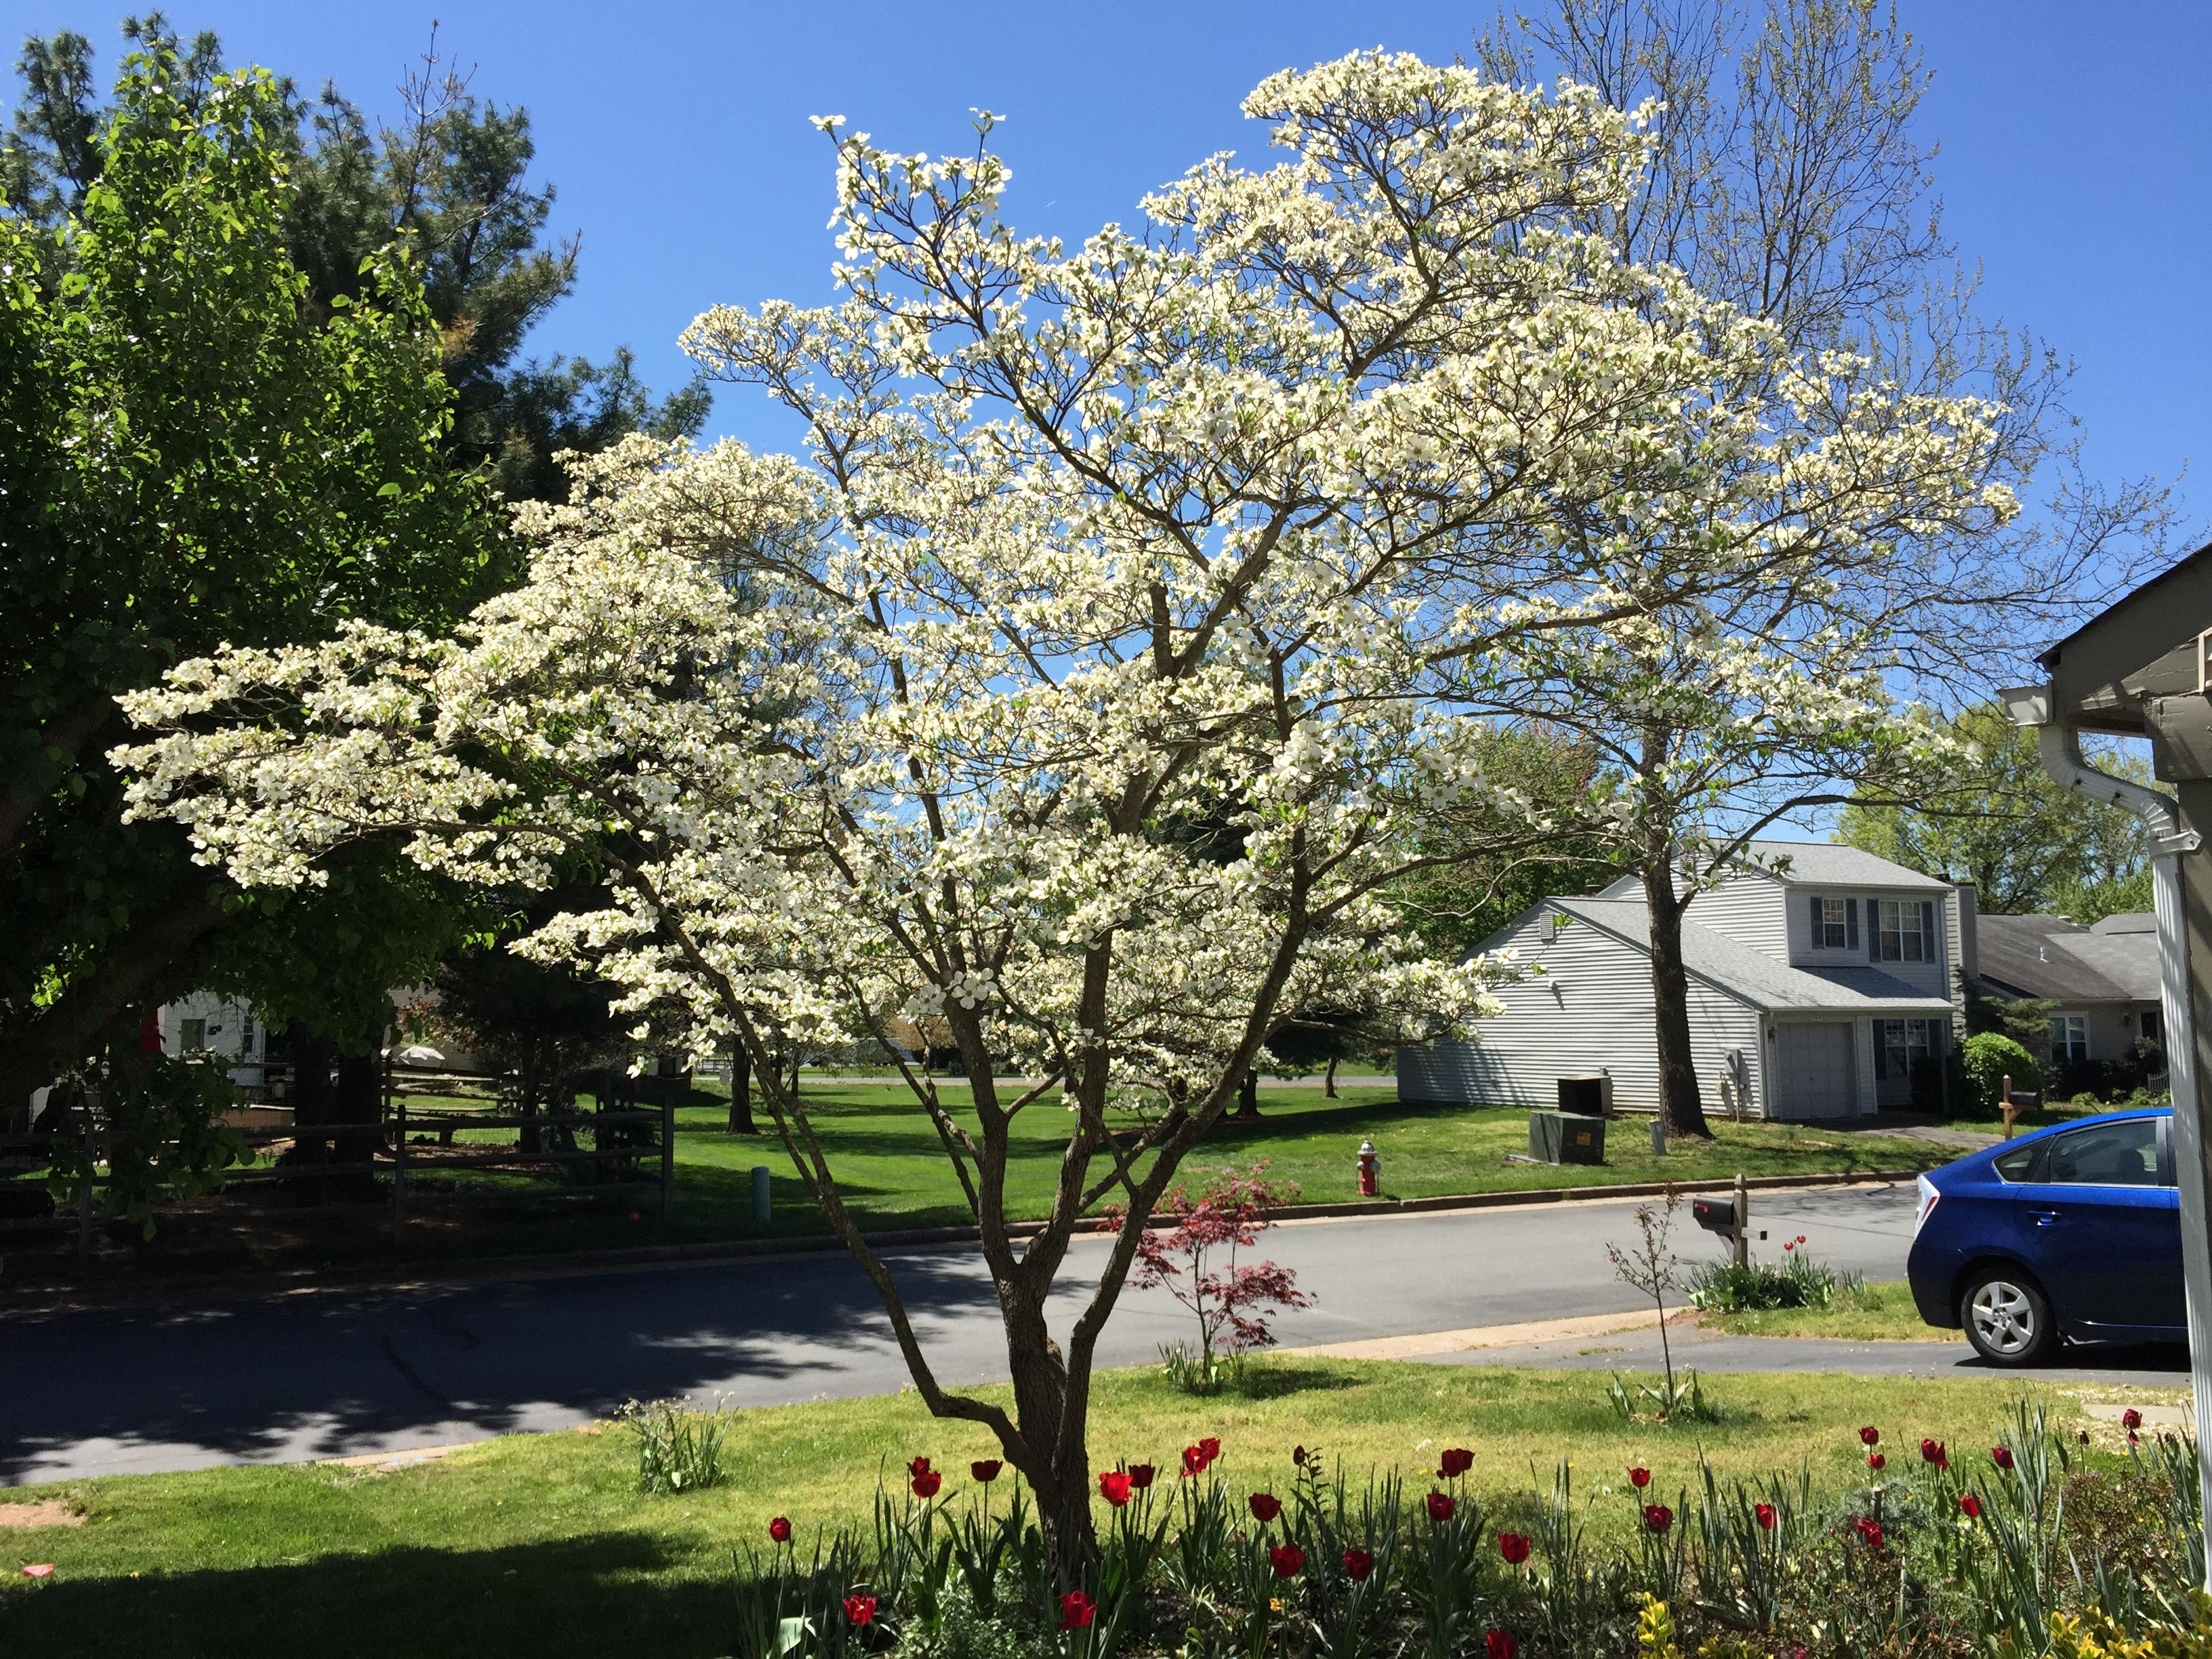 File2016 04 20 12 10 40 White Flowering Dogwood Blooming Along